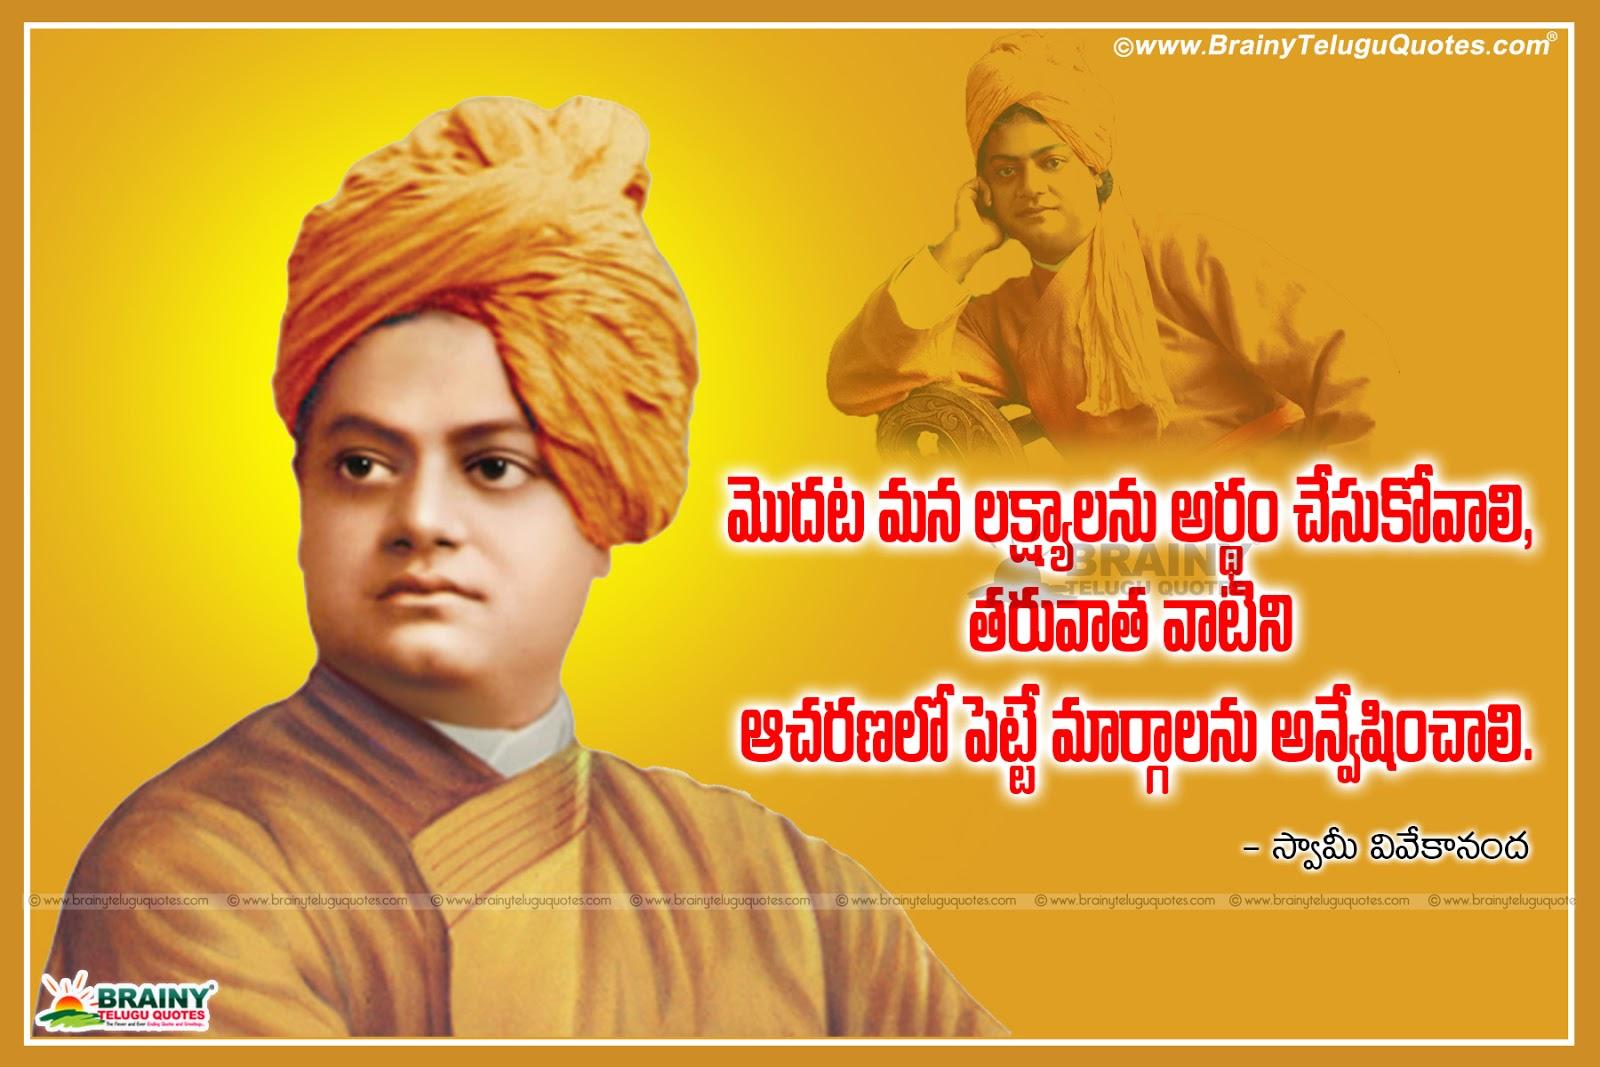 Swami vivekananda telugu best inspirational quotes ...